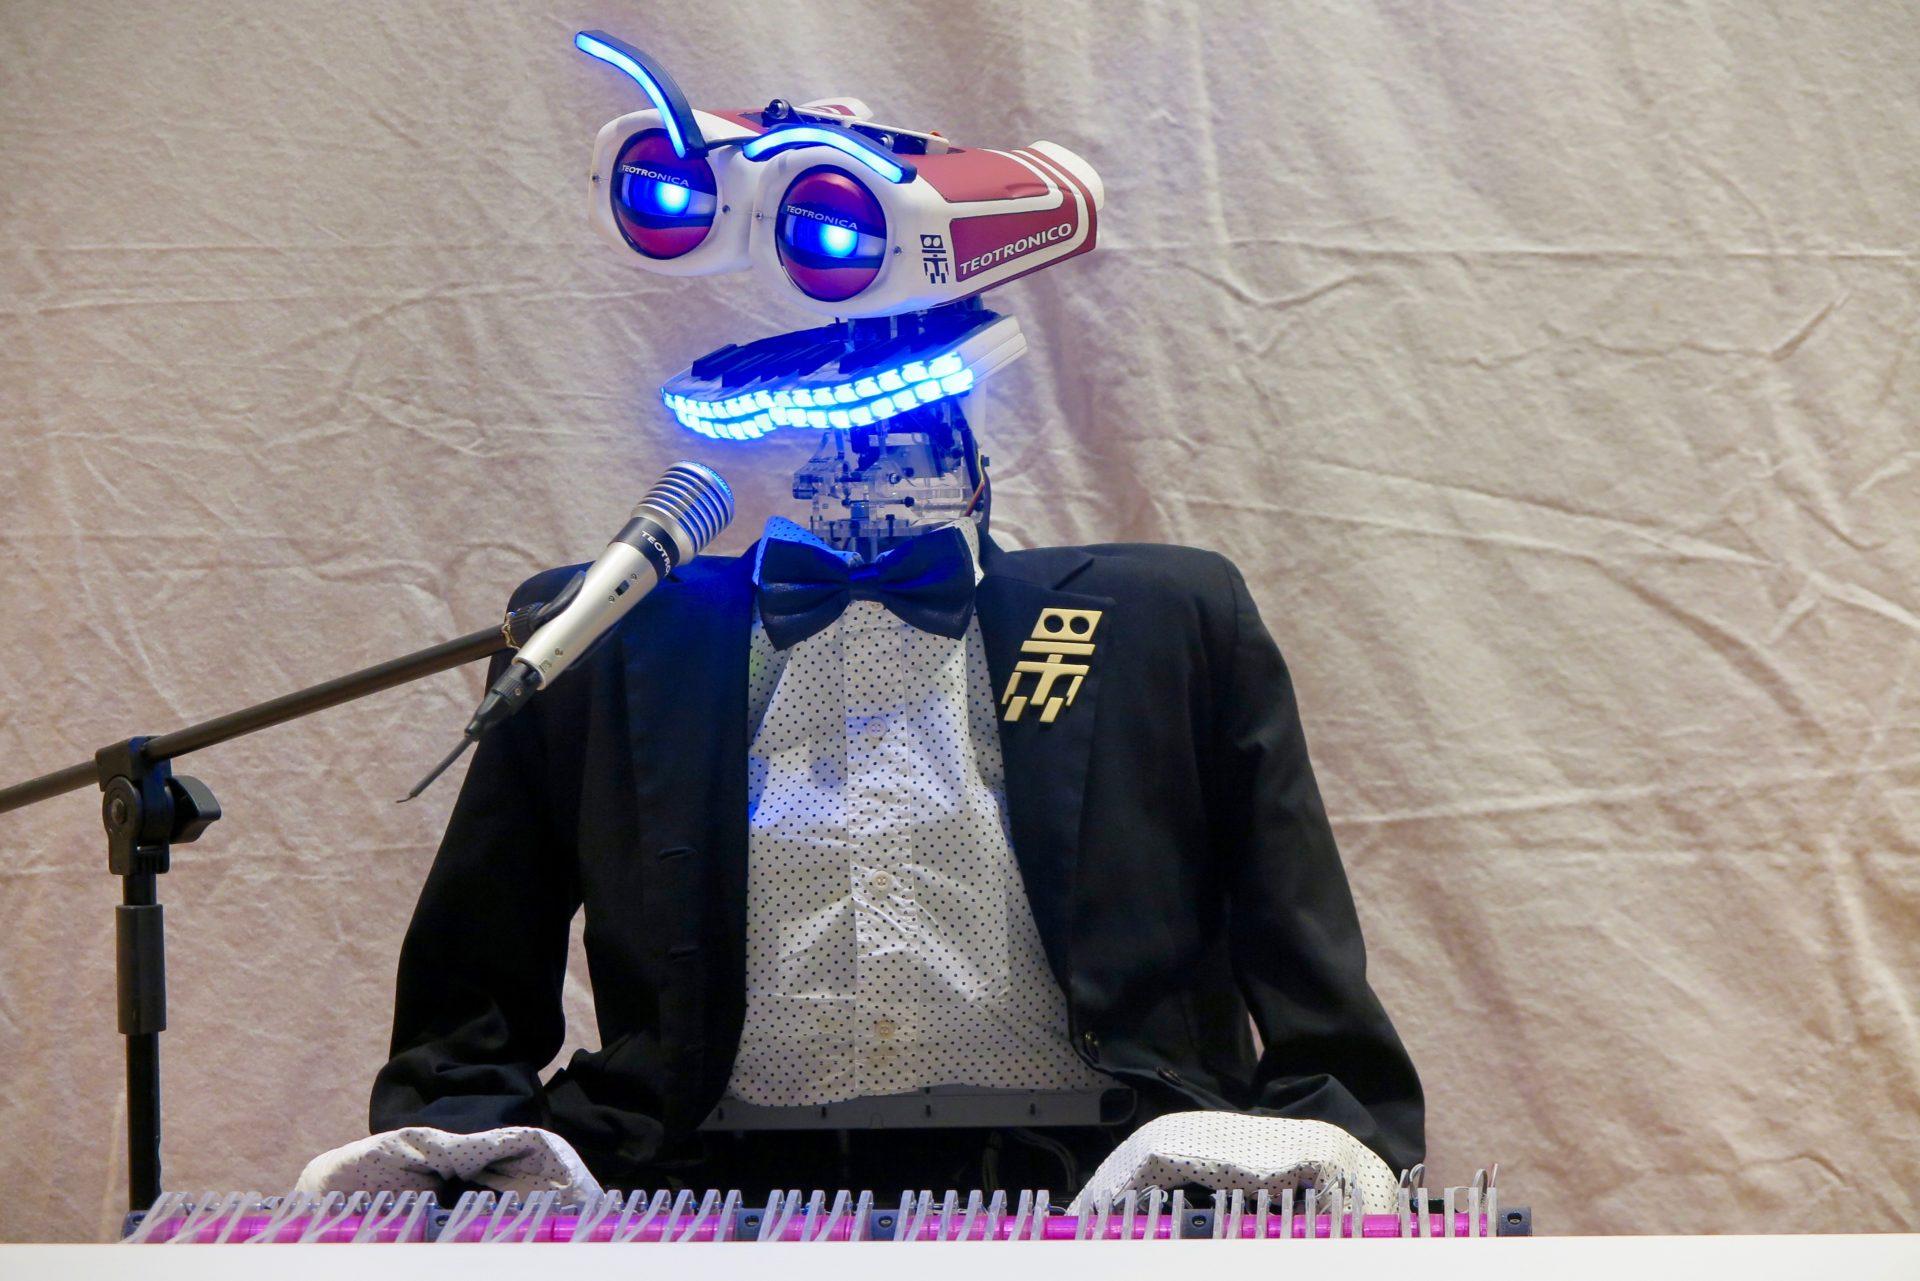 Il pianista robot Teo Tronico